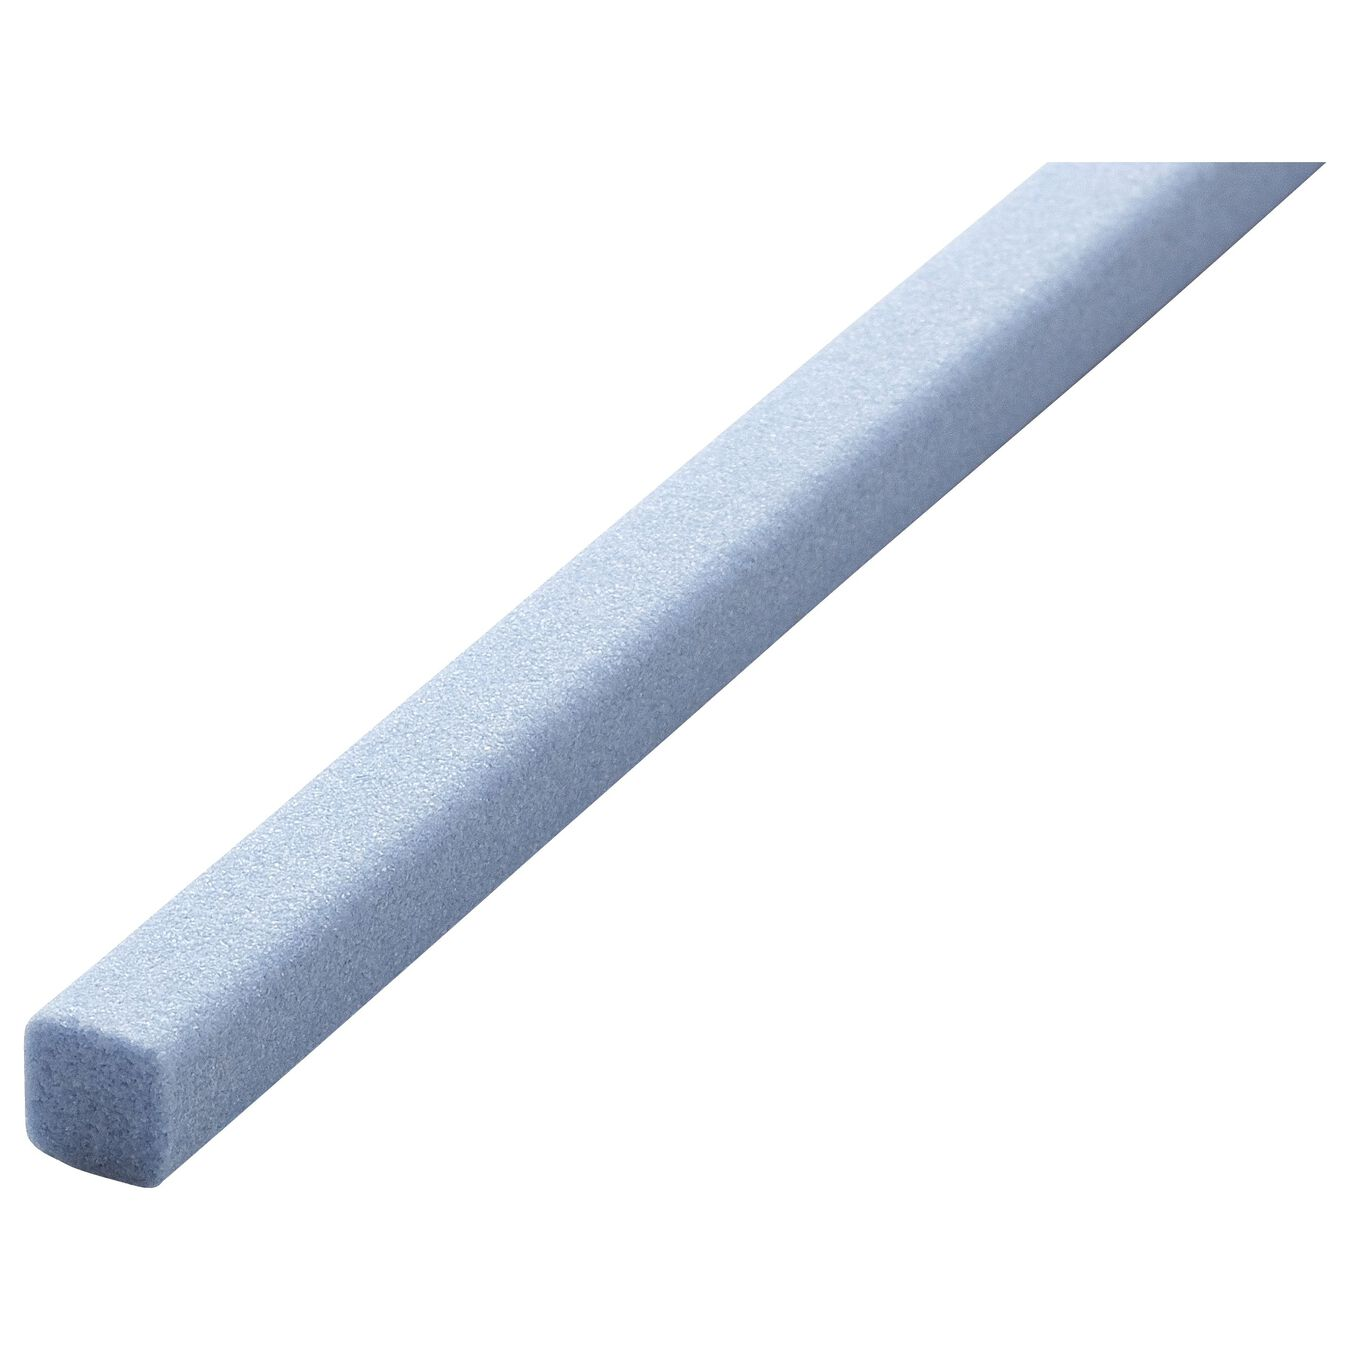 Sharpening rod, 2 cm | blue | Ceramic,,large 2